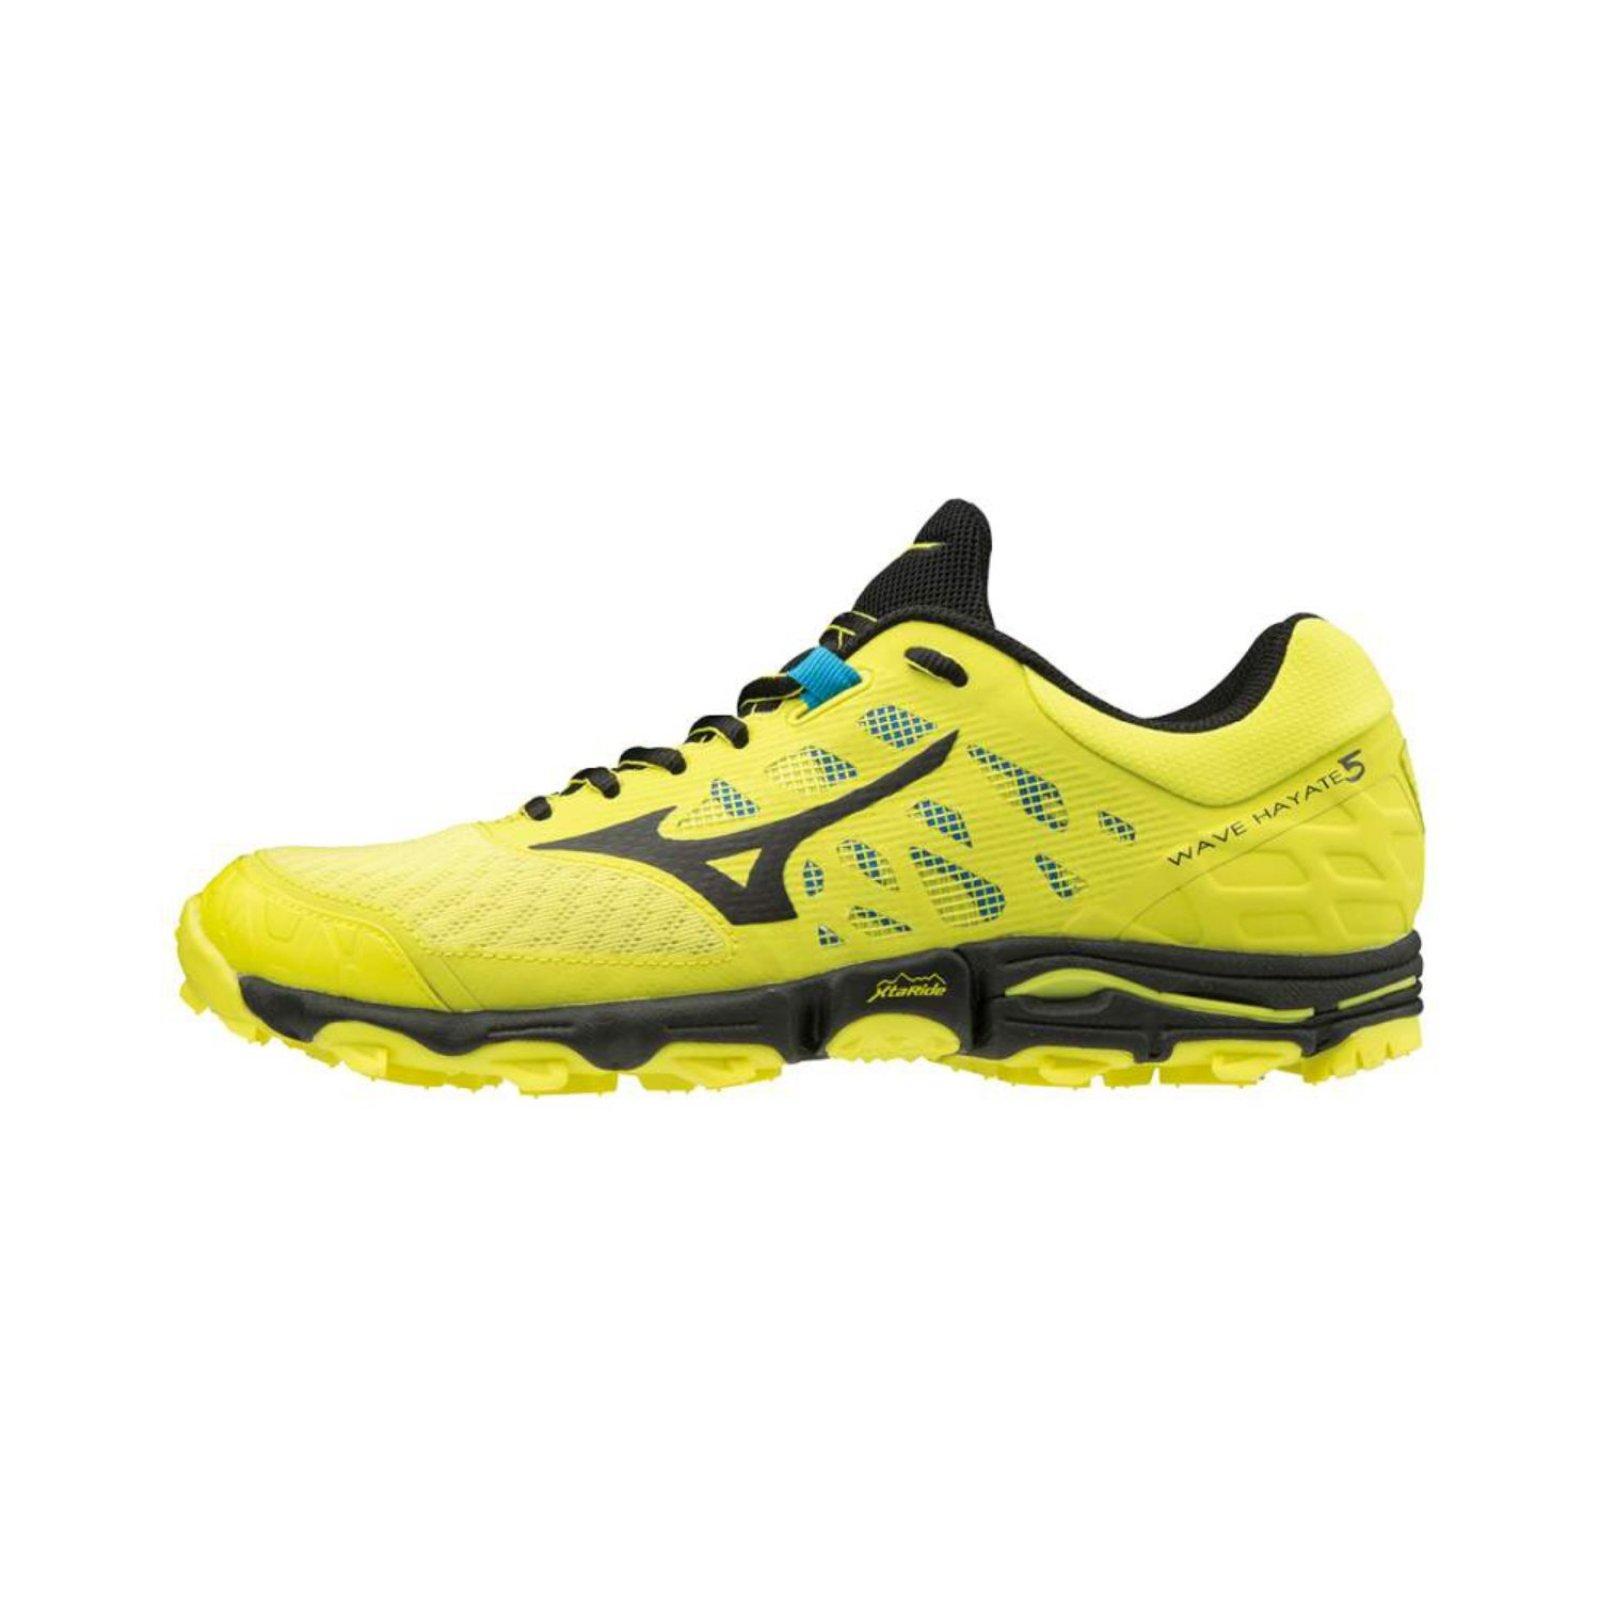 Pánska bežecká obuv Mizuno Wave Hayate 5 J1GJ197209 - Actisport.sk a104a77b5a0